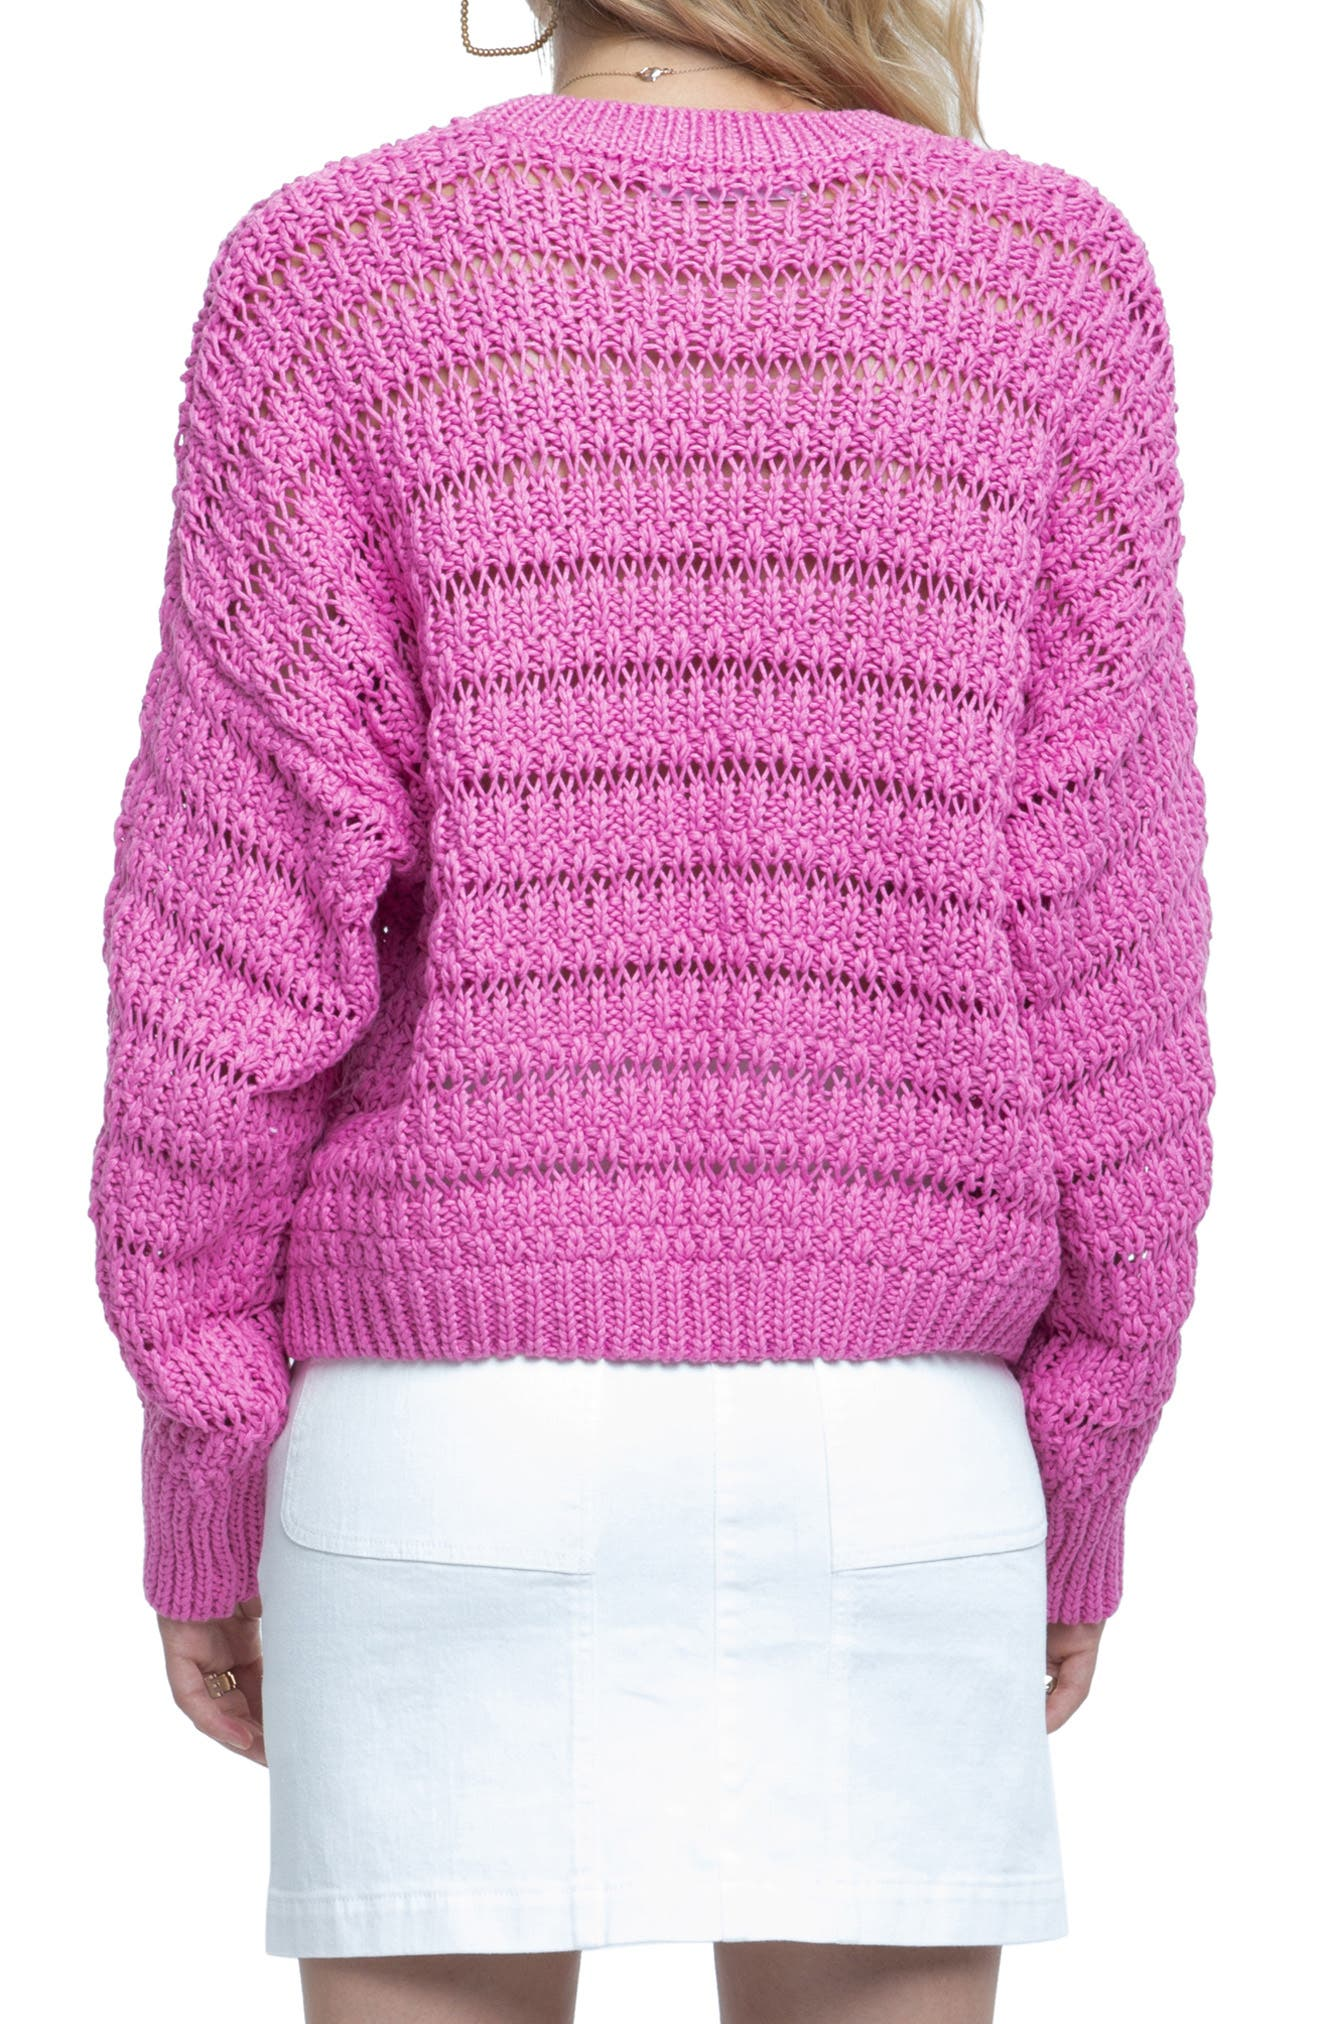 ASTR THE LABEL,                             Bobbi Sweater,                             Alternate thumbnail 2, color,                             651